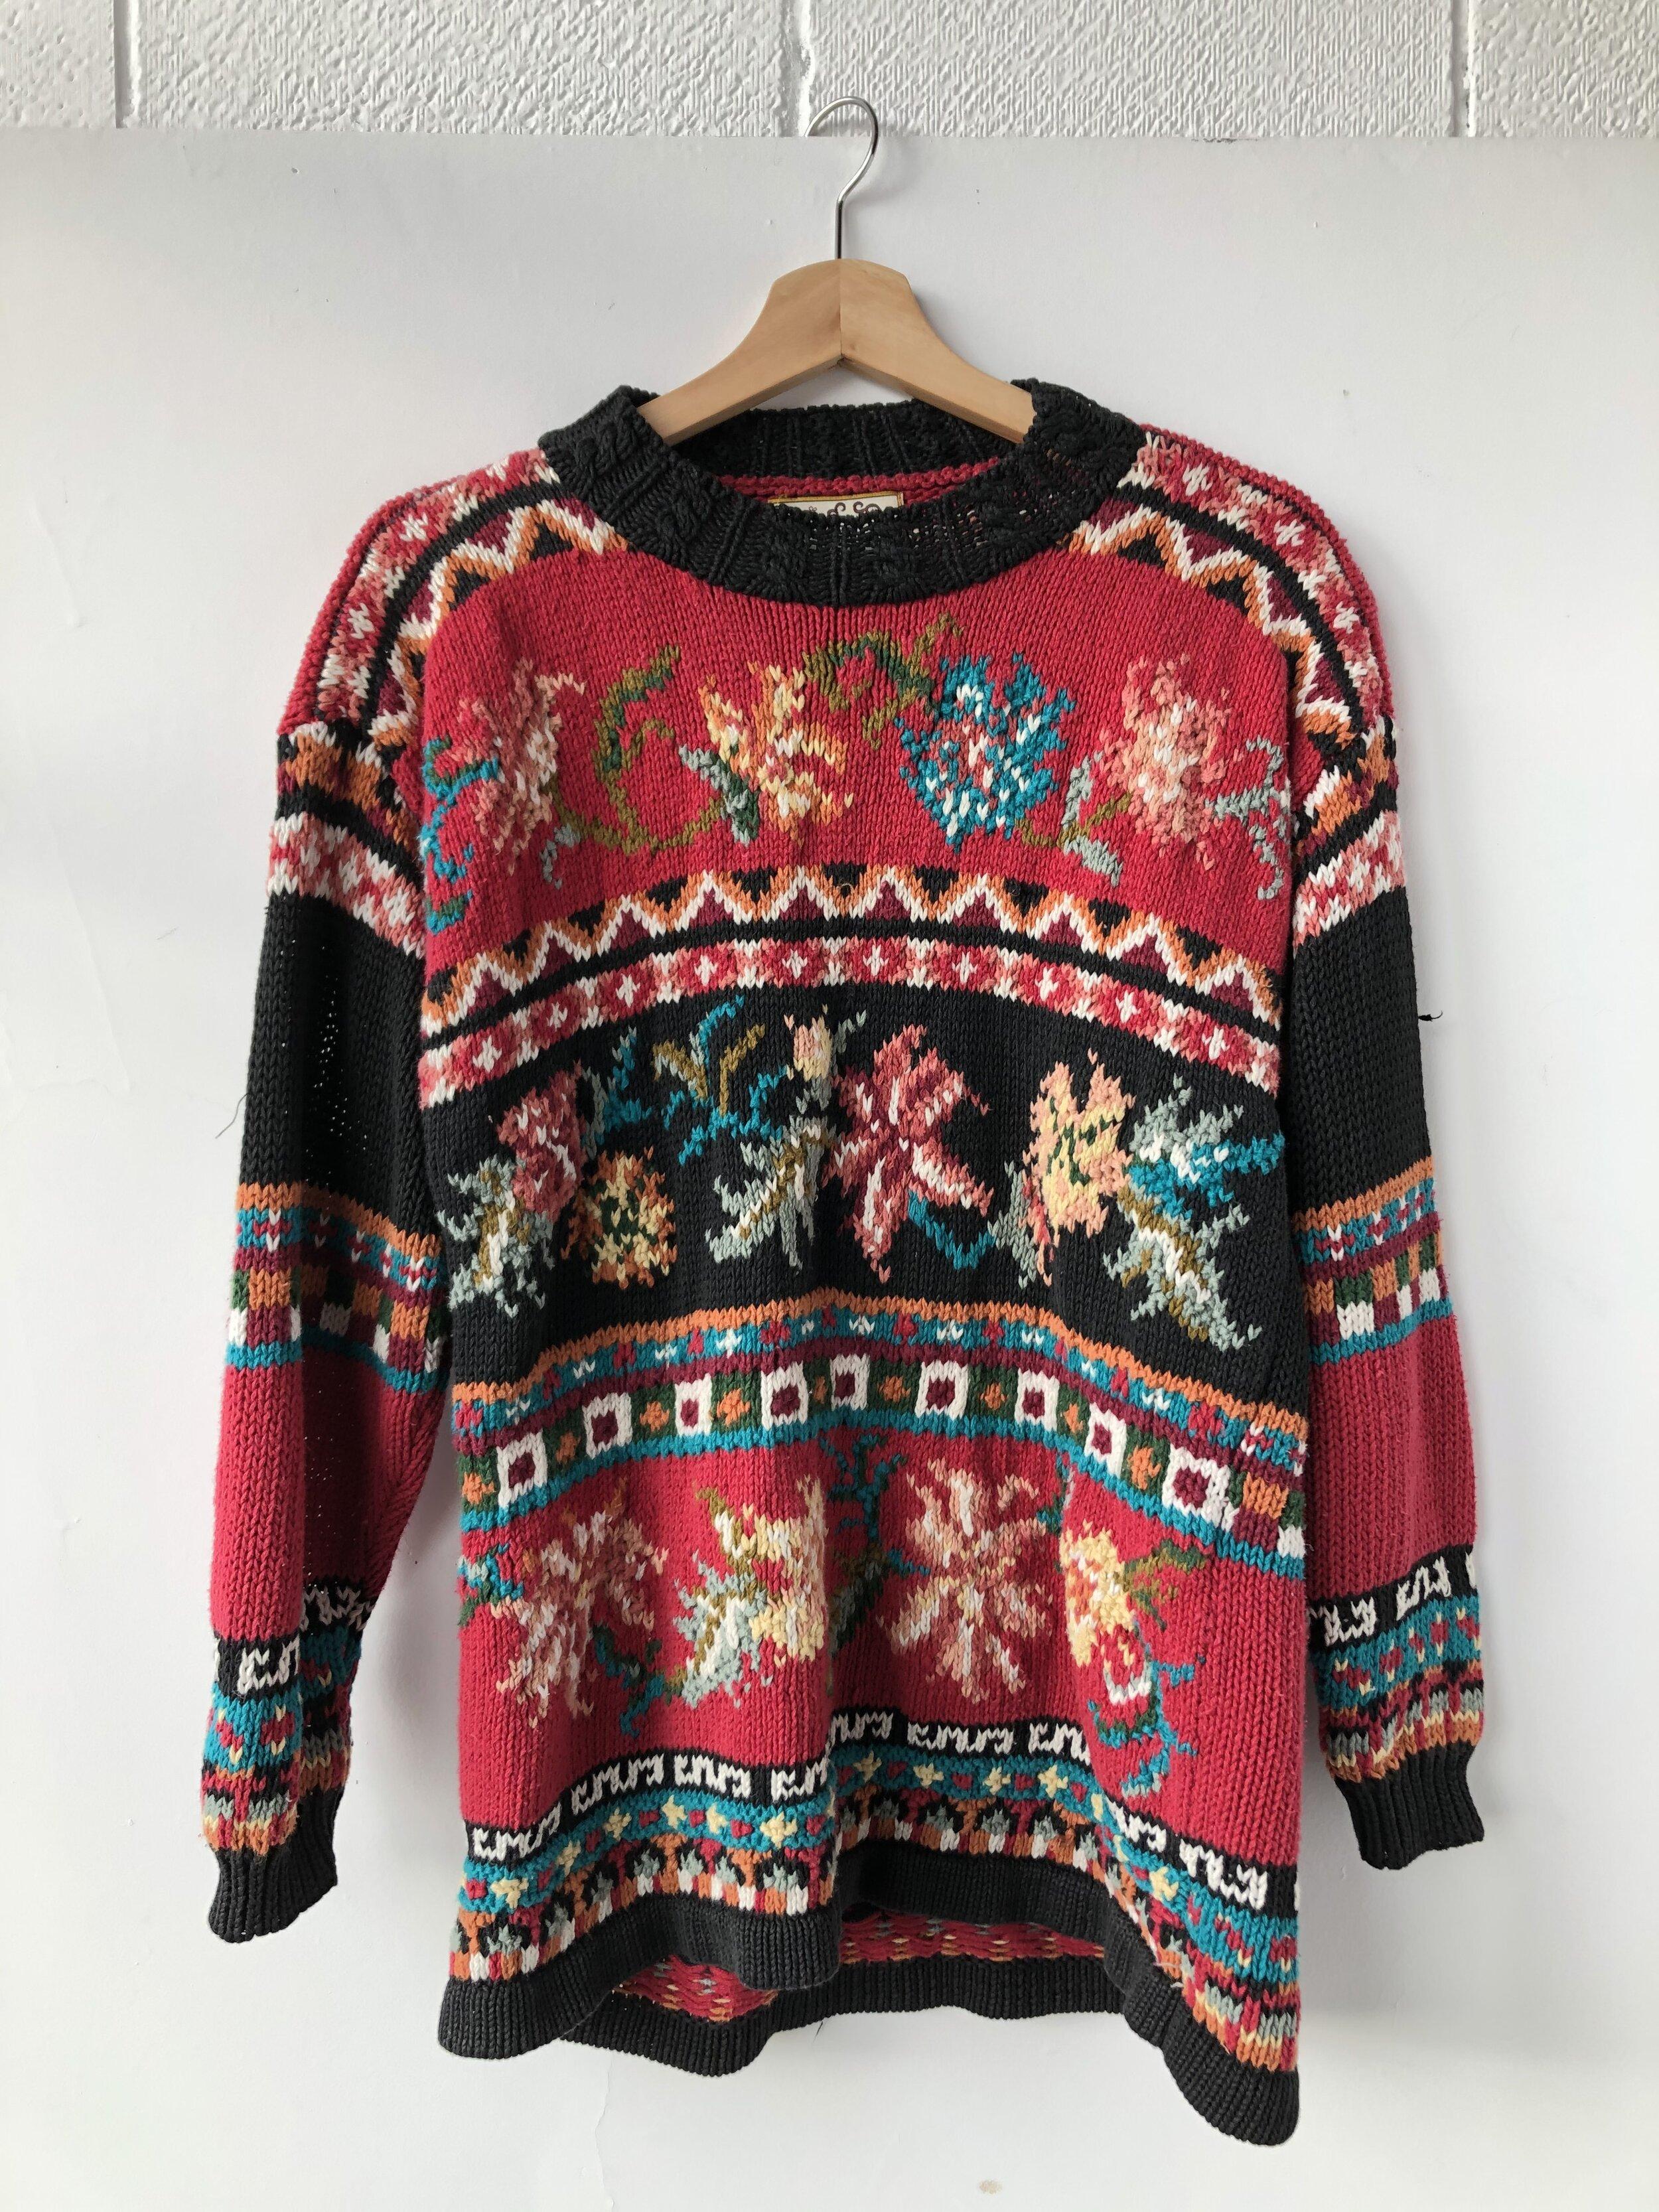 Vintage sweater; Size L, $24